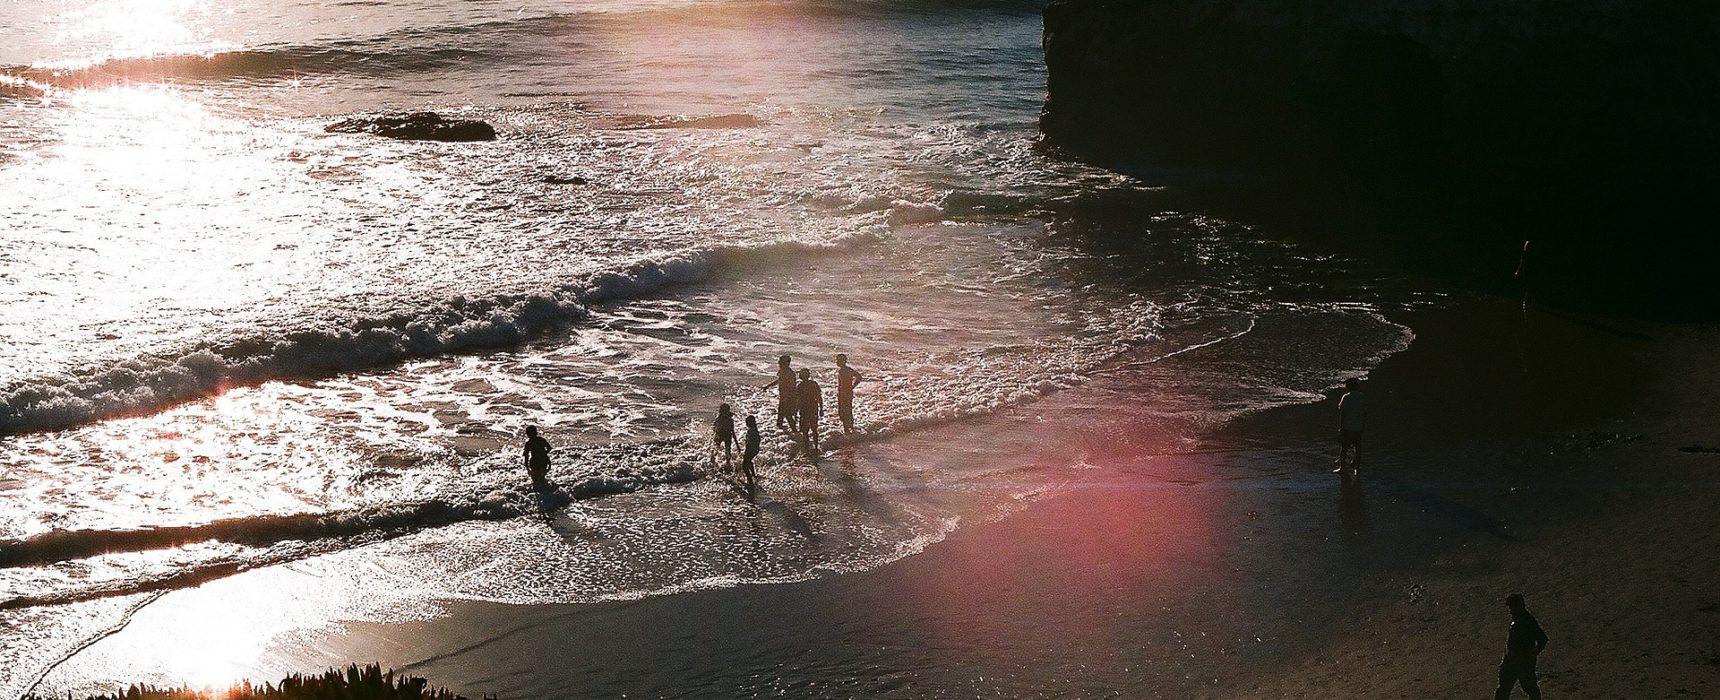 Kinder bewundern den Sonnenuntergang